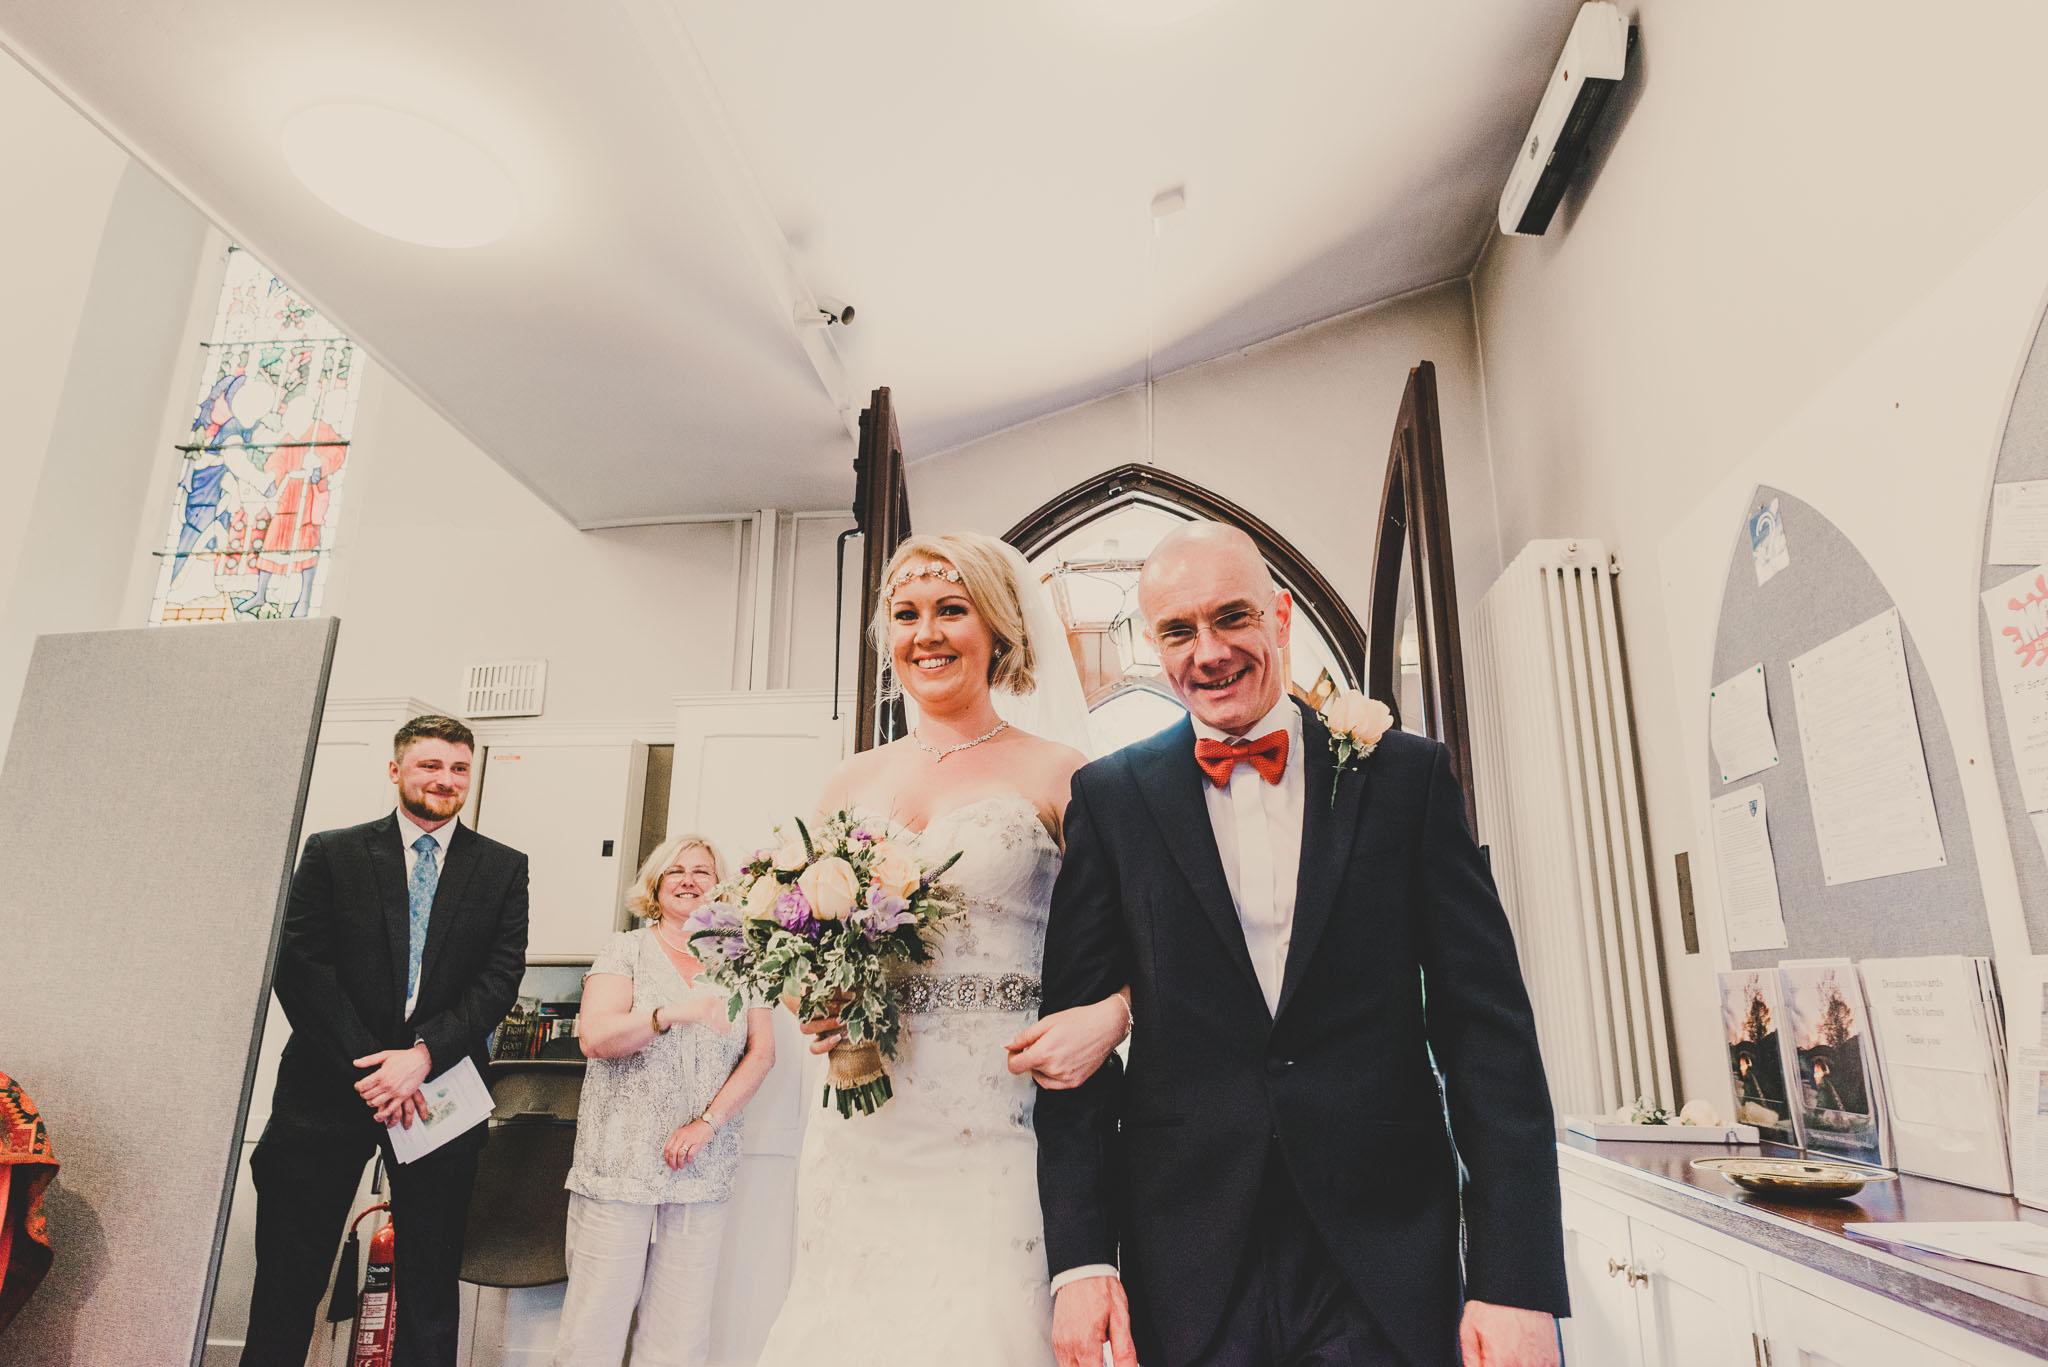 2 romantic and intimate wedding phtography (16).jpg